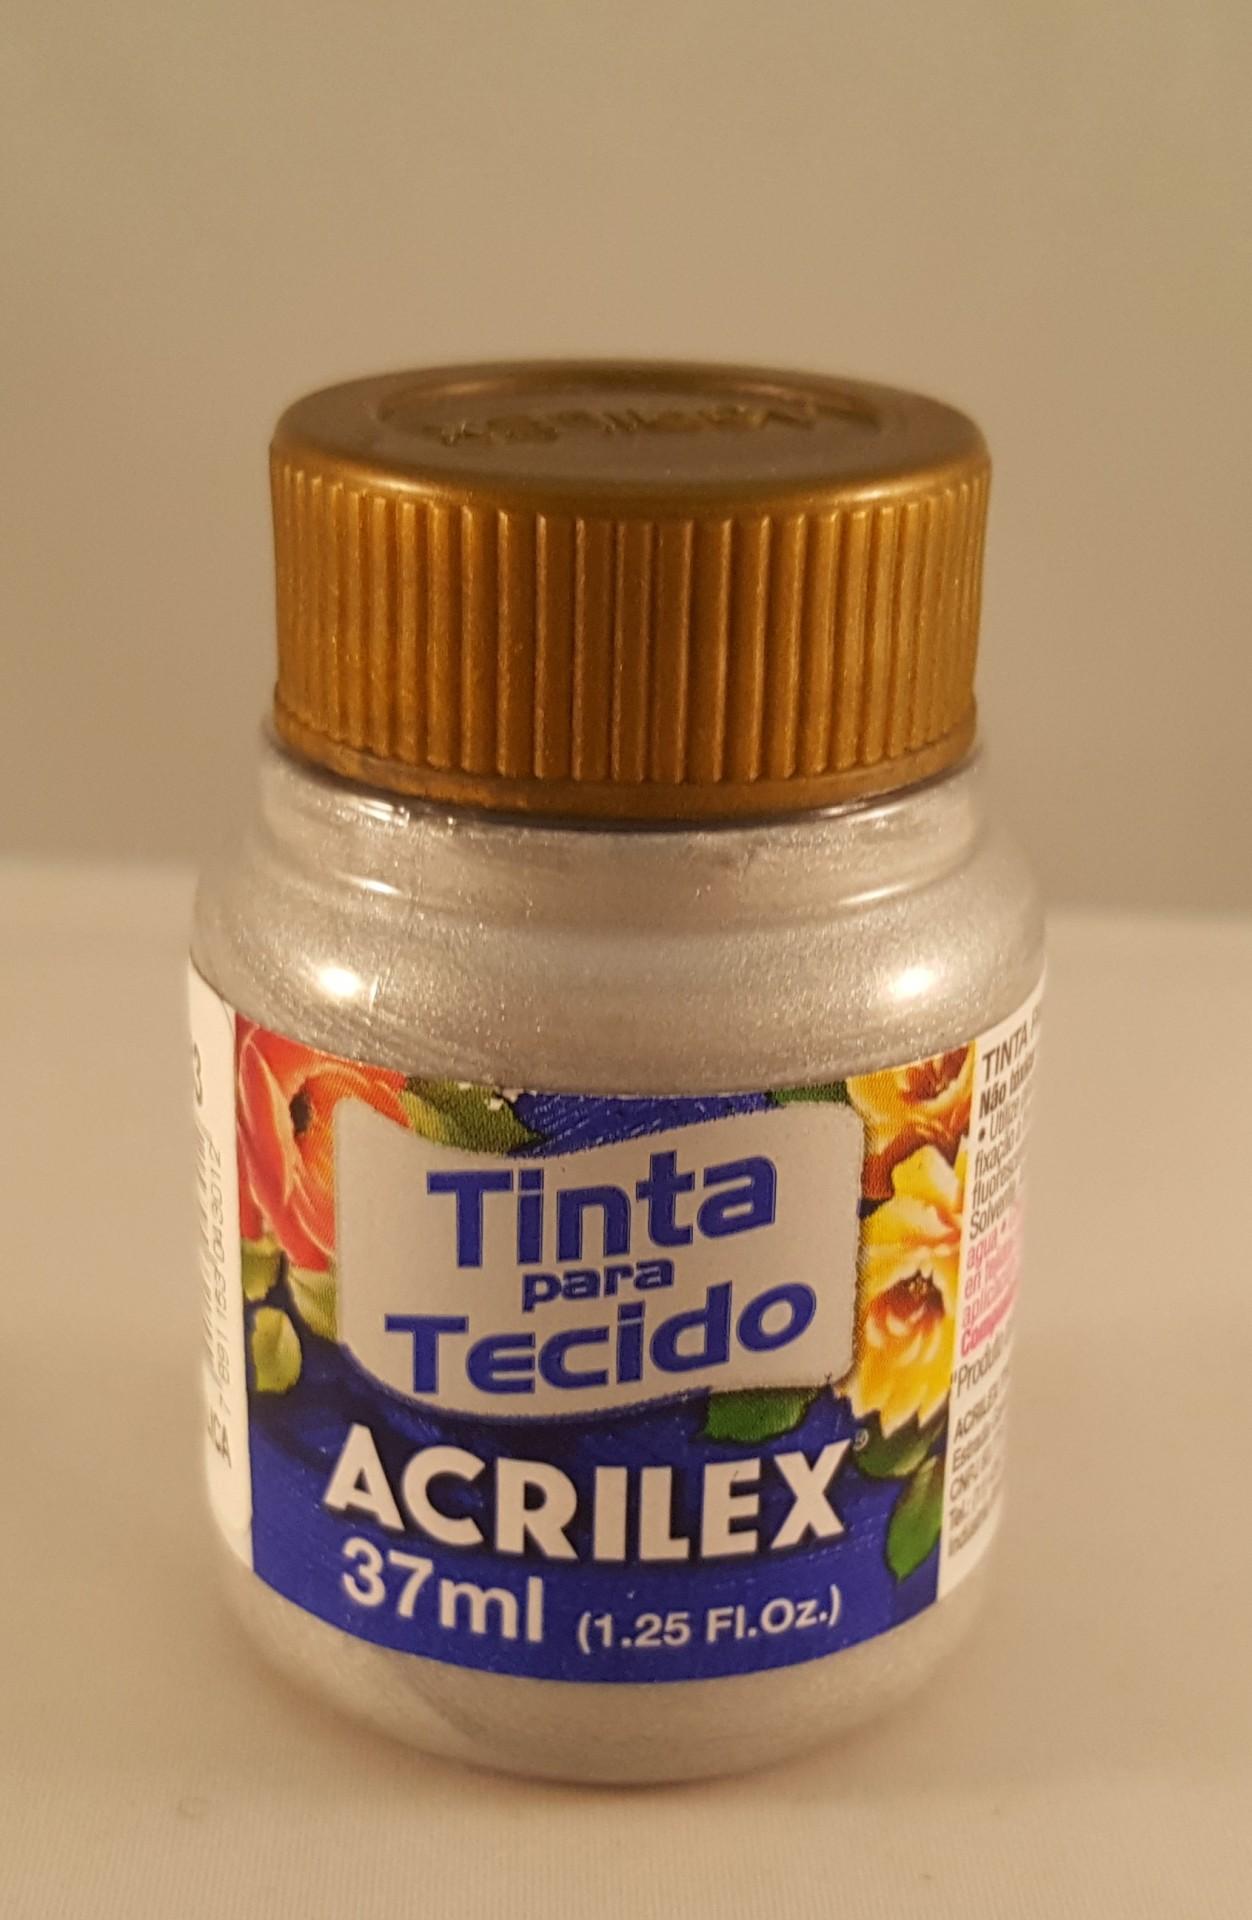 Tinta Tecido Acrilex metálica prata 533